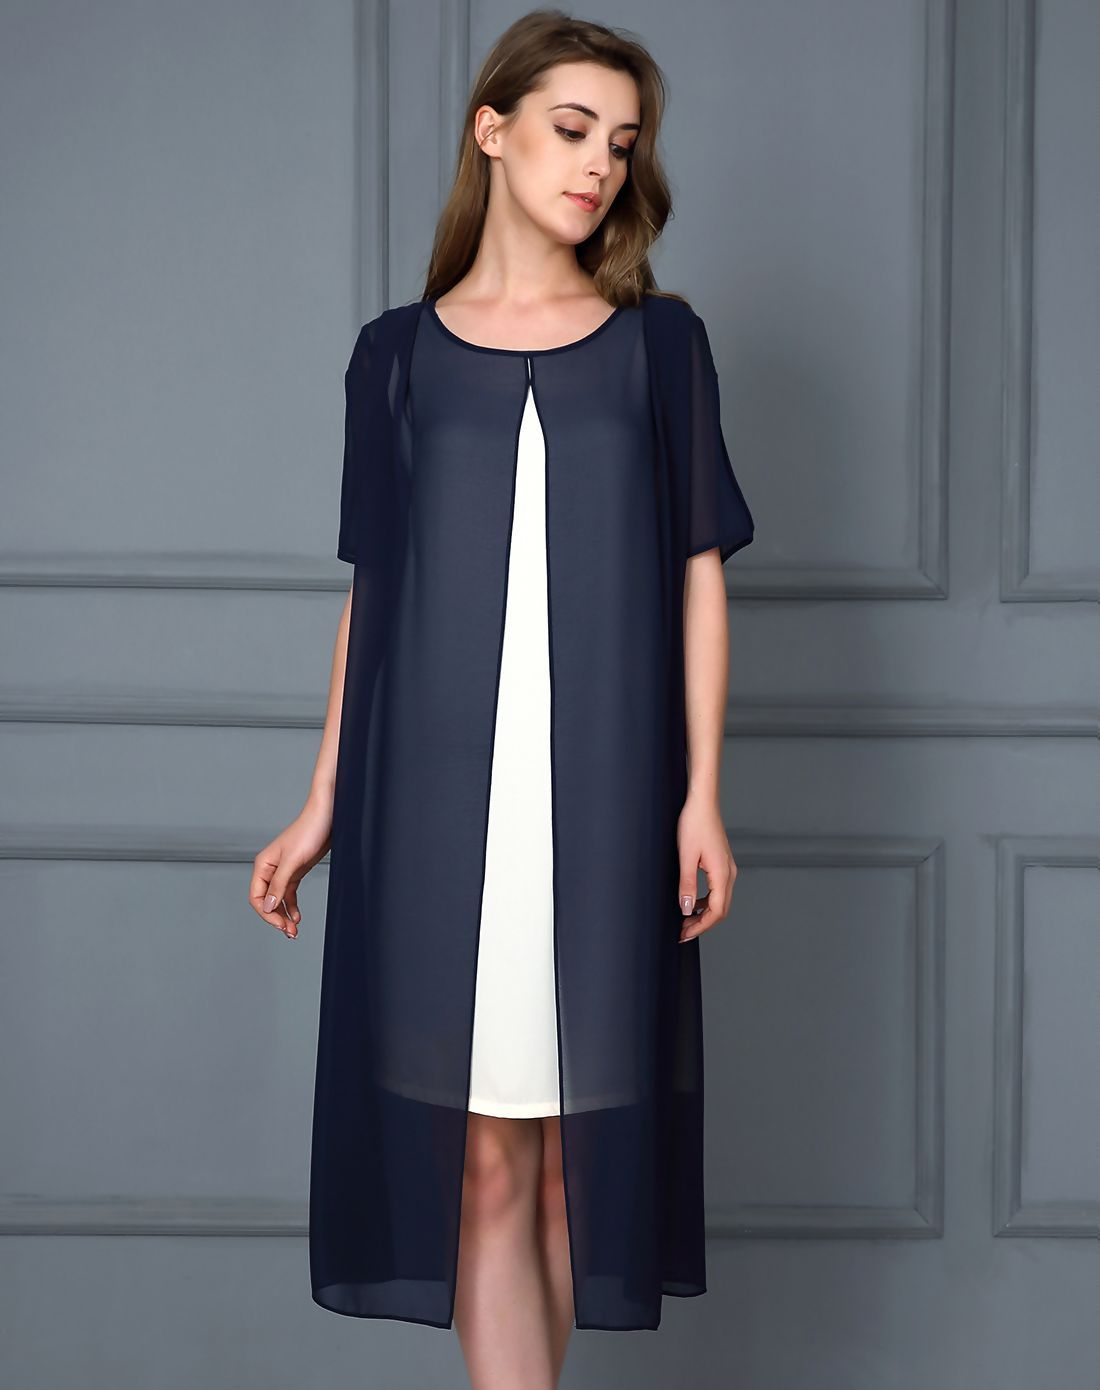 Adorewe vipme shift dressesdesigner themeans royal blue half